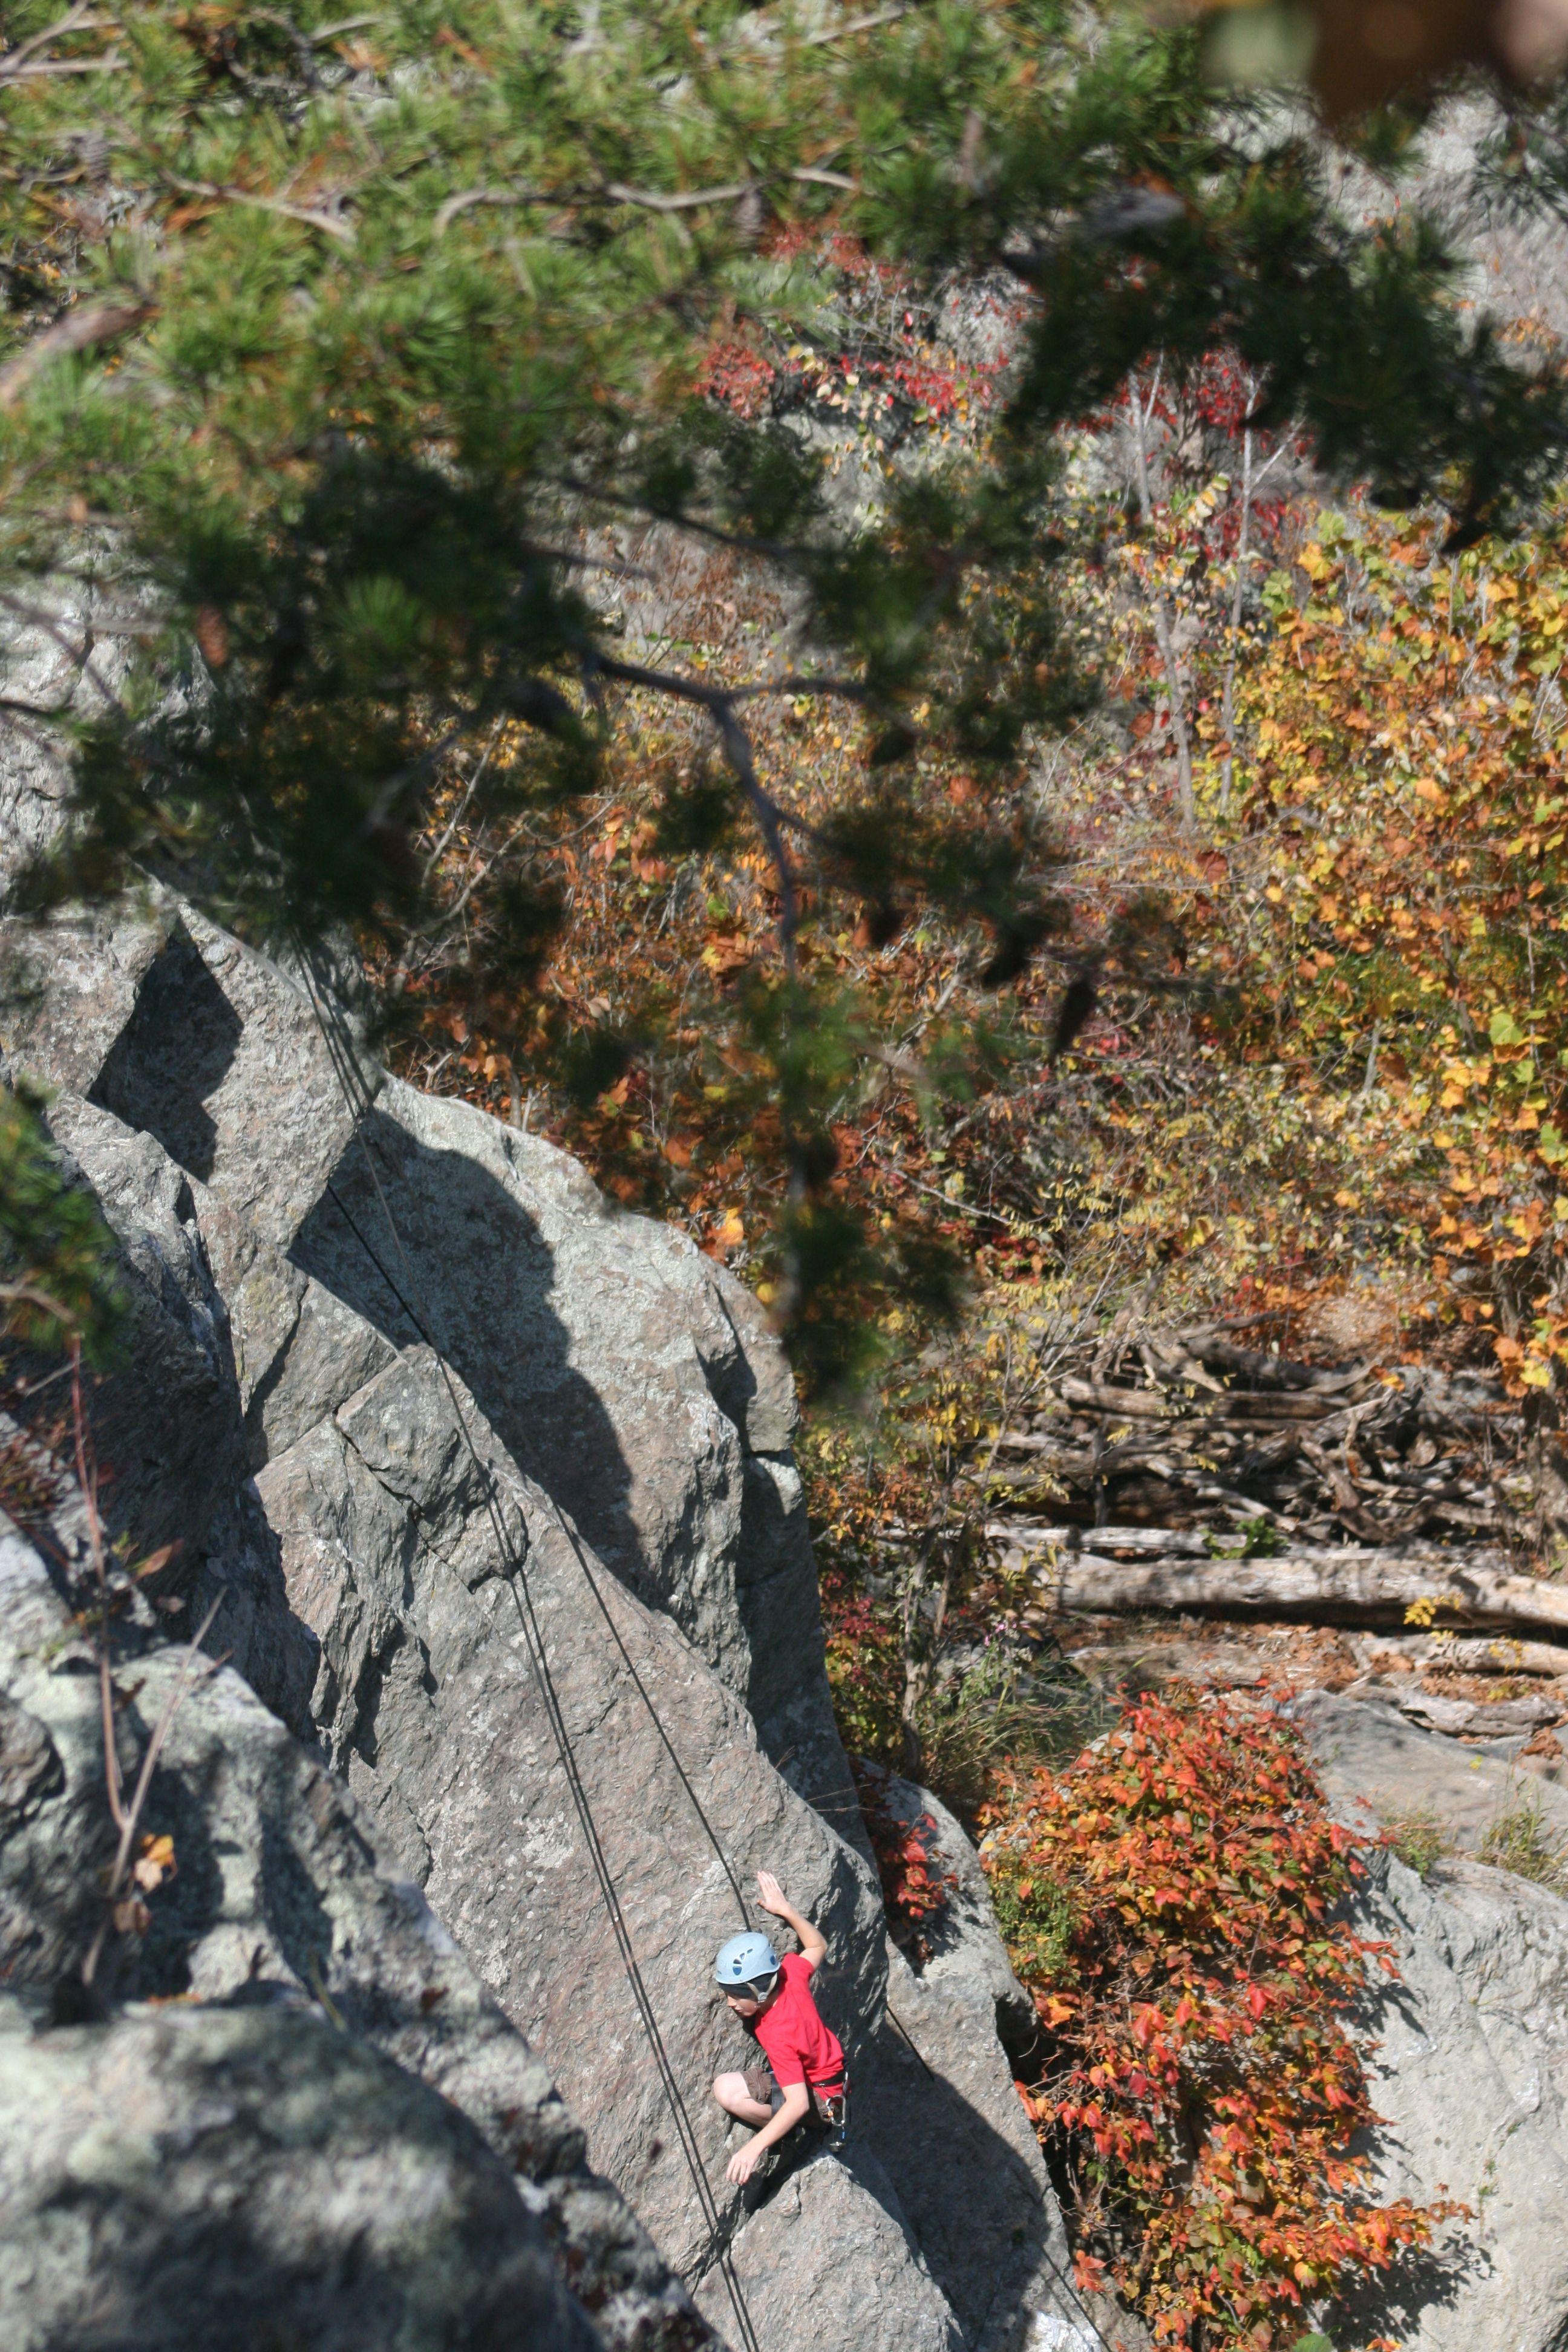 Rock Climber at Great Falls National Park - Virginia Side